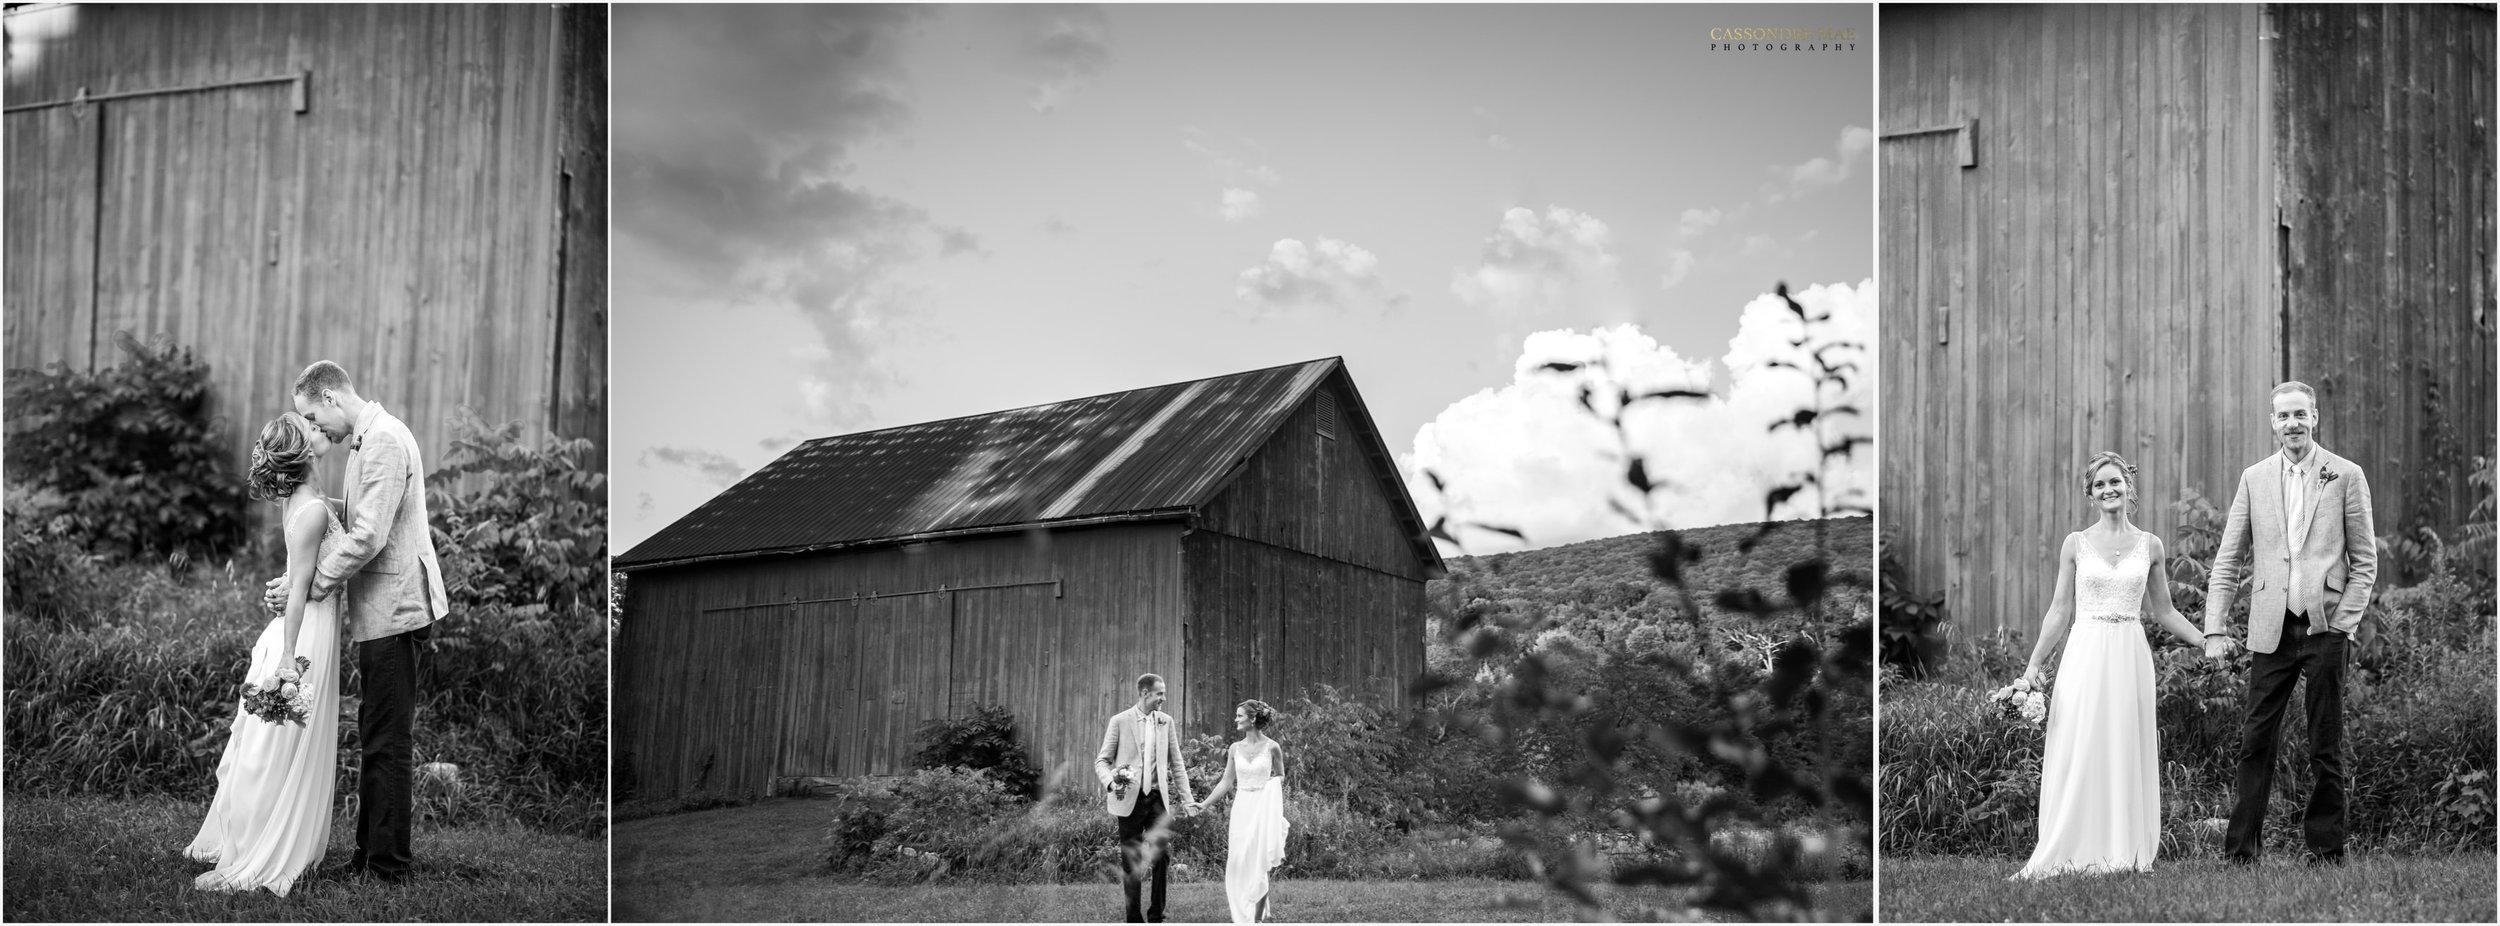 Cassondre Mae Photography Warwick NY Wedding Photographer -25.jpg